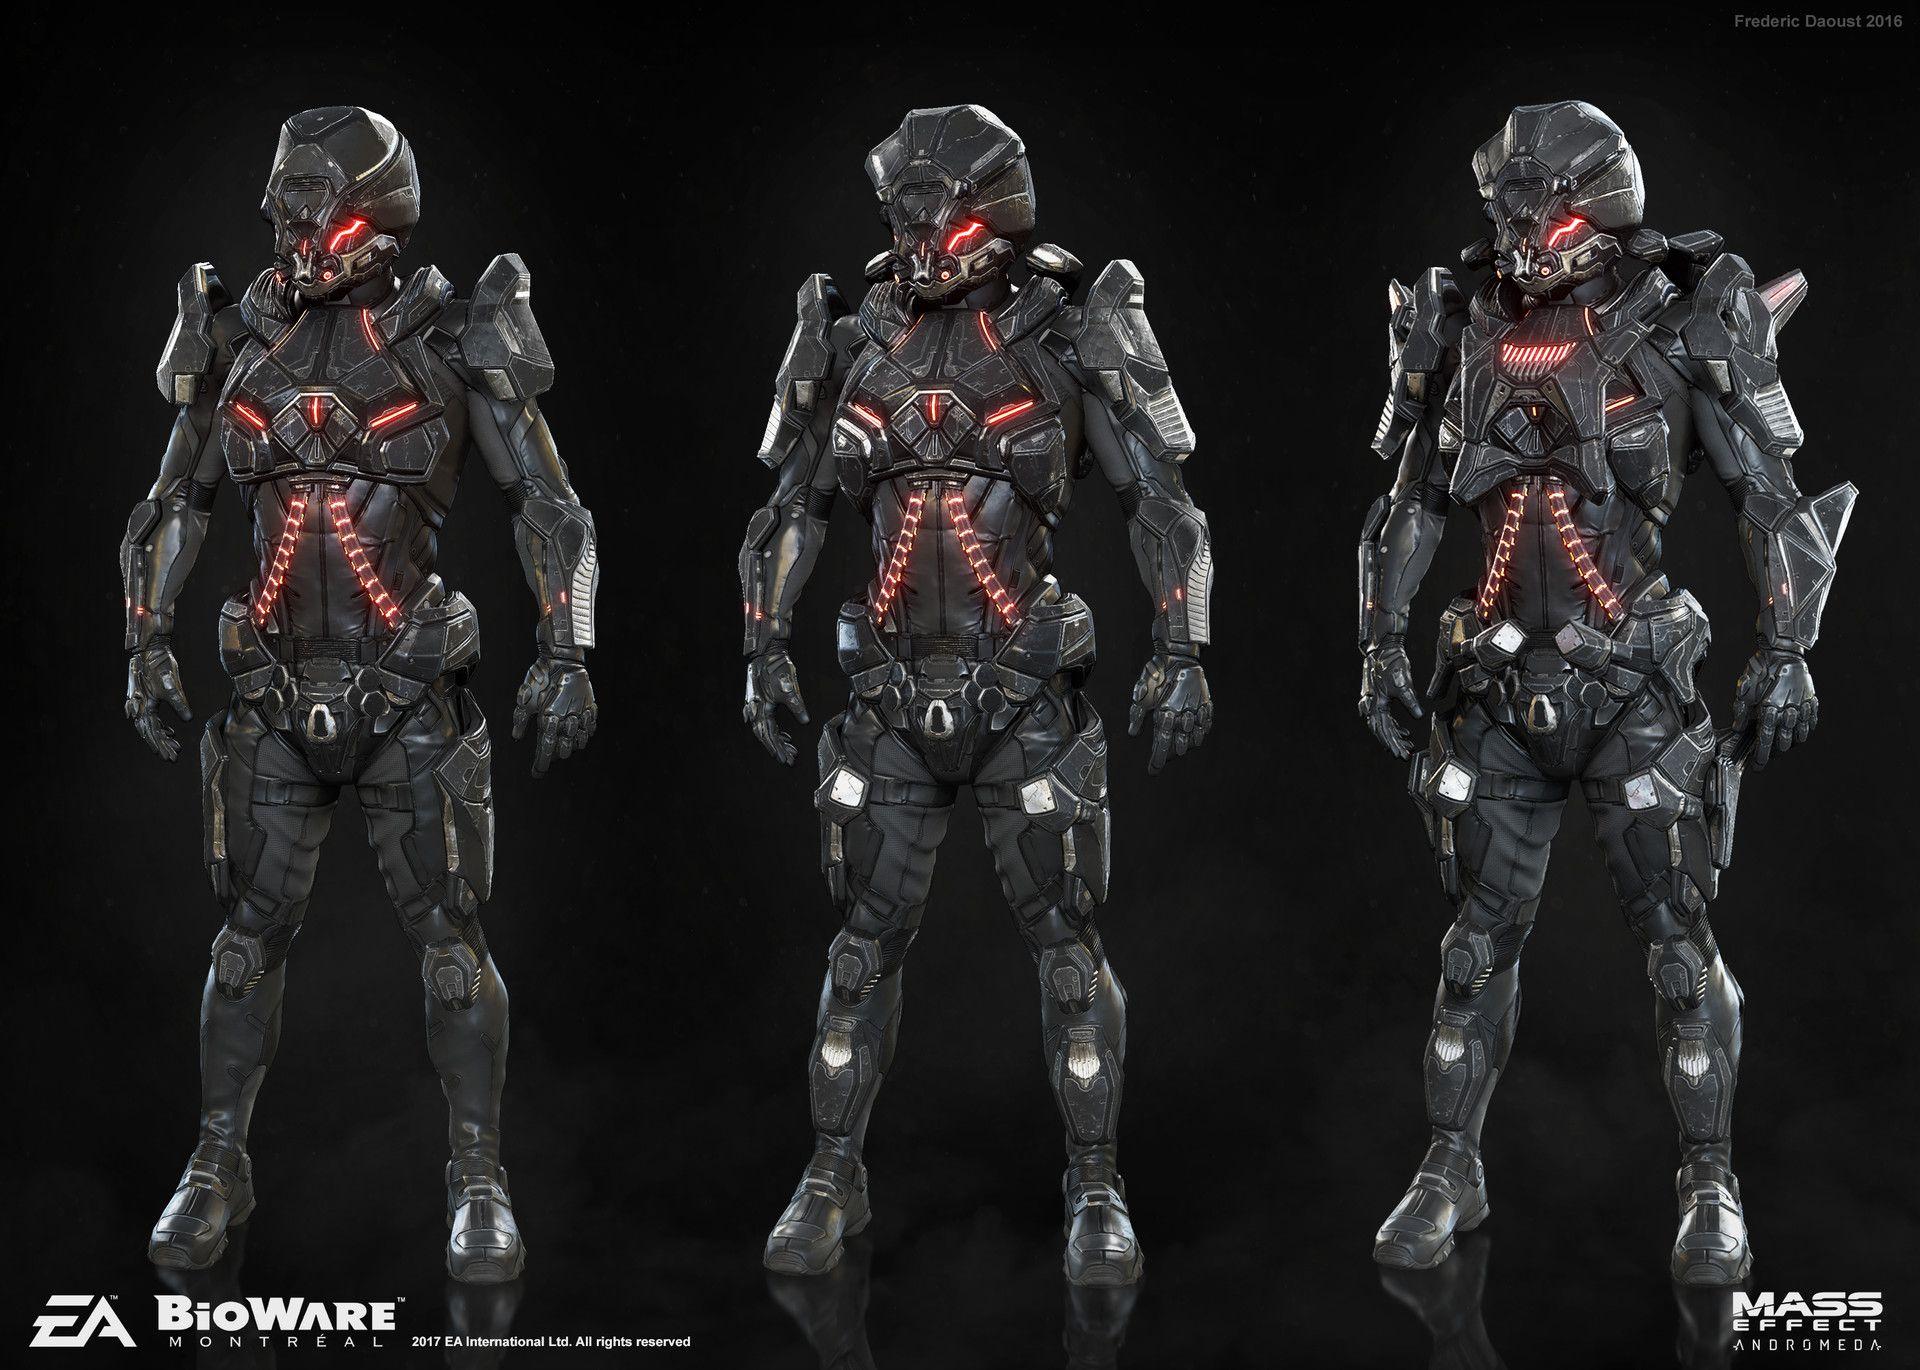 N7 Armor Mass Effect Andromeda: Mass Effect: ANDROMEDA Remnant Armor Set